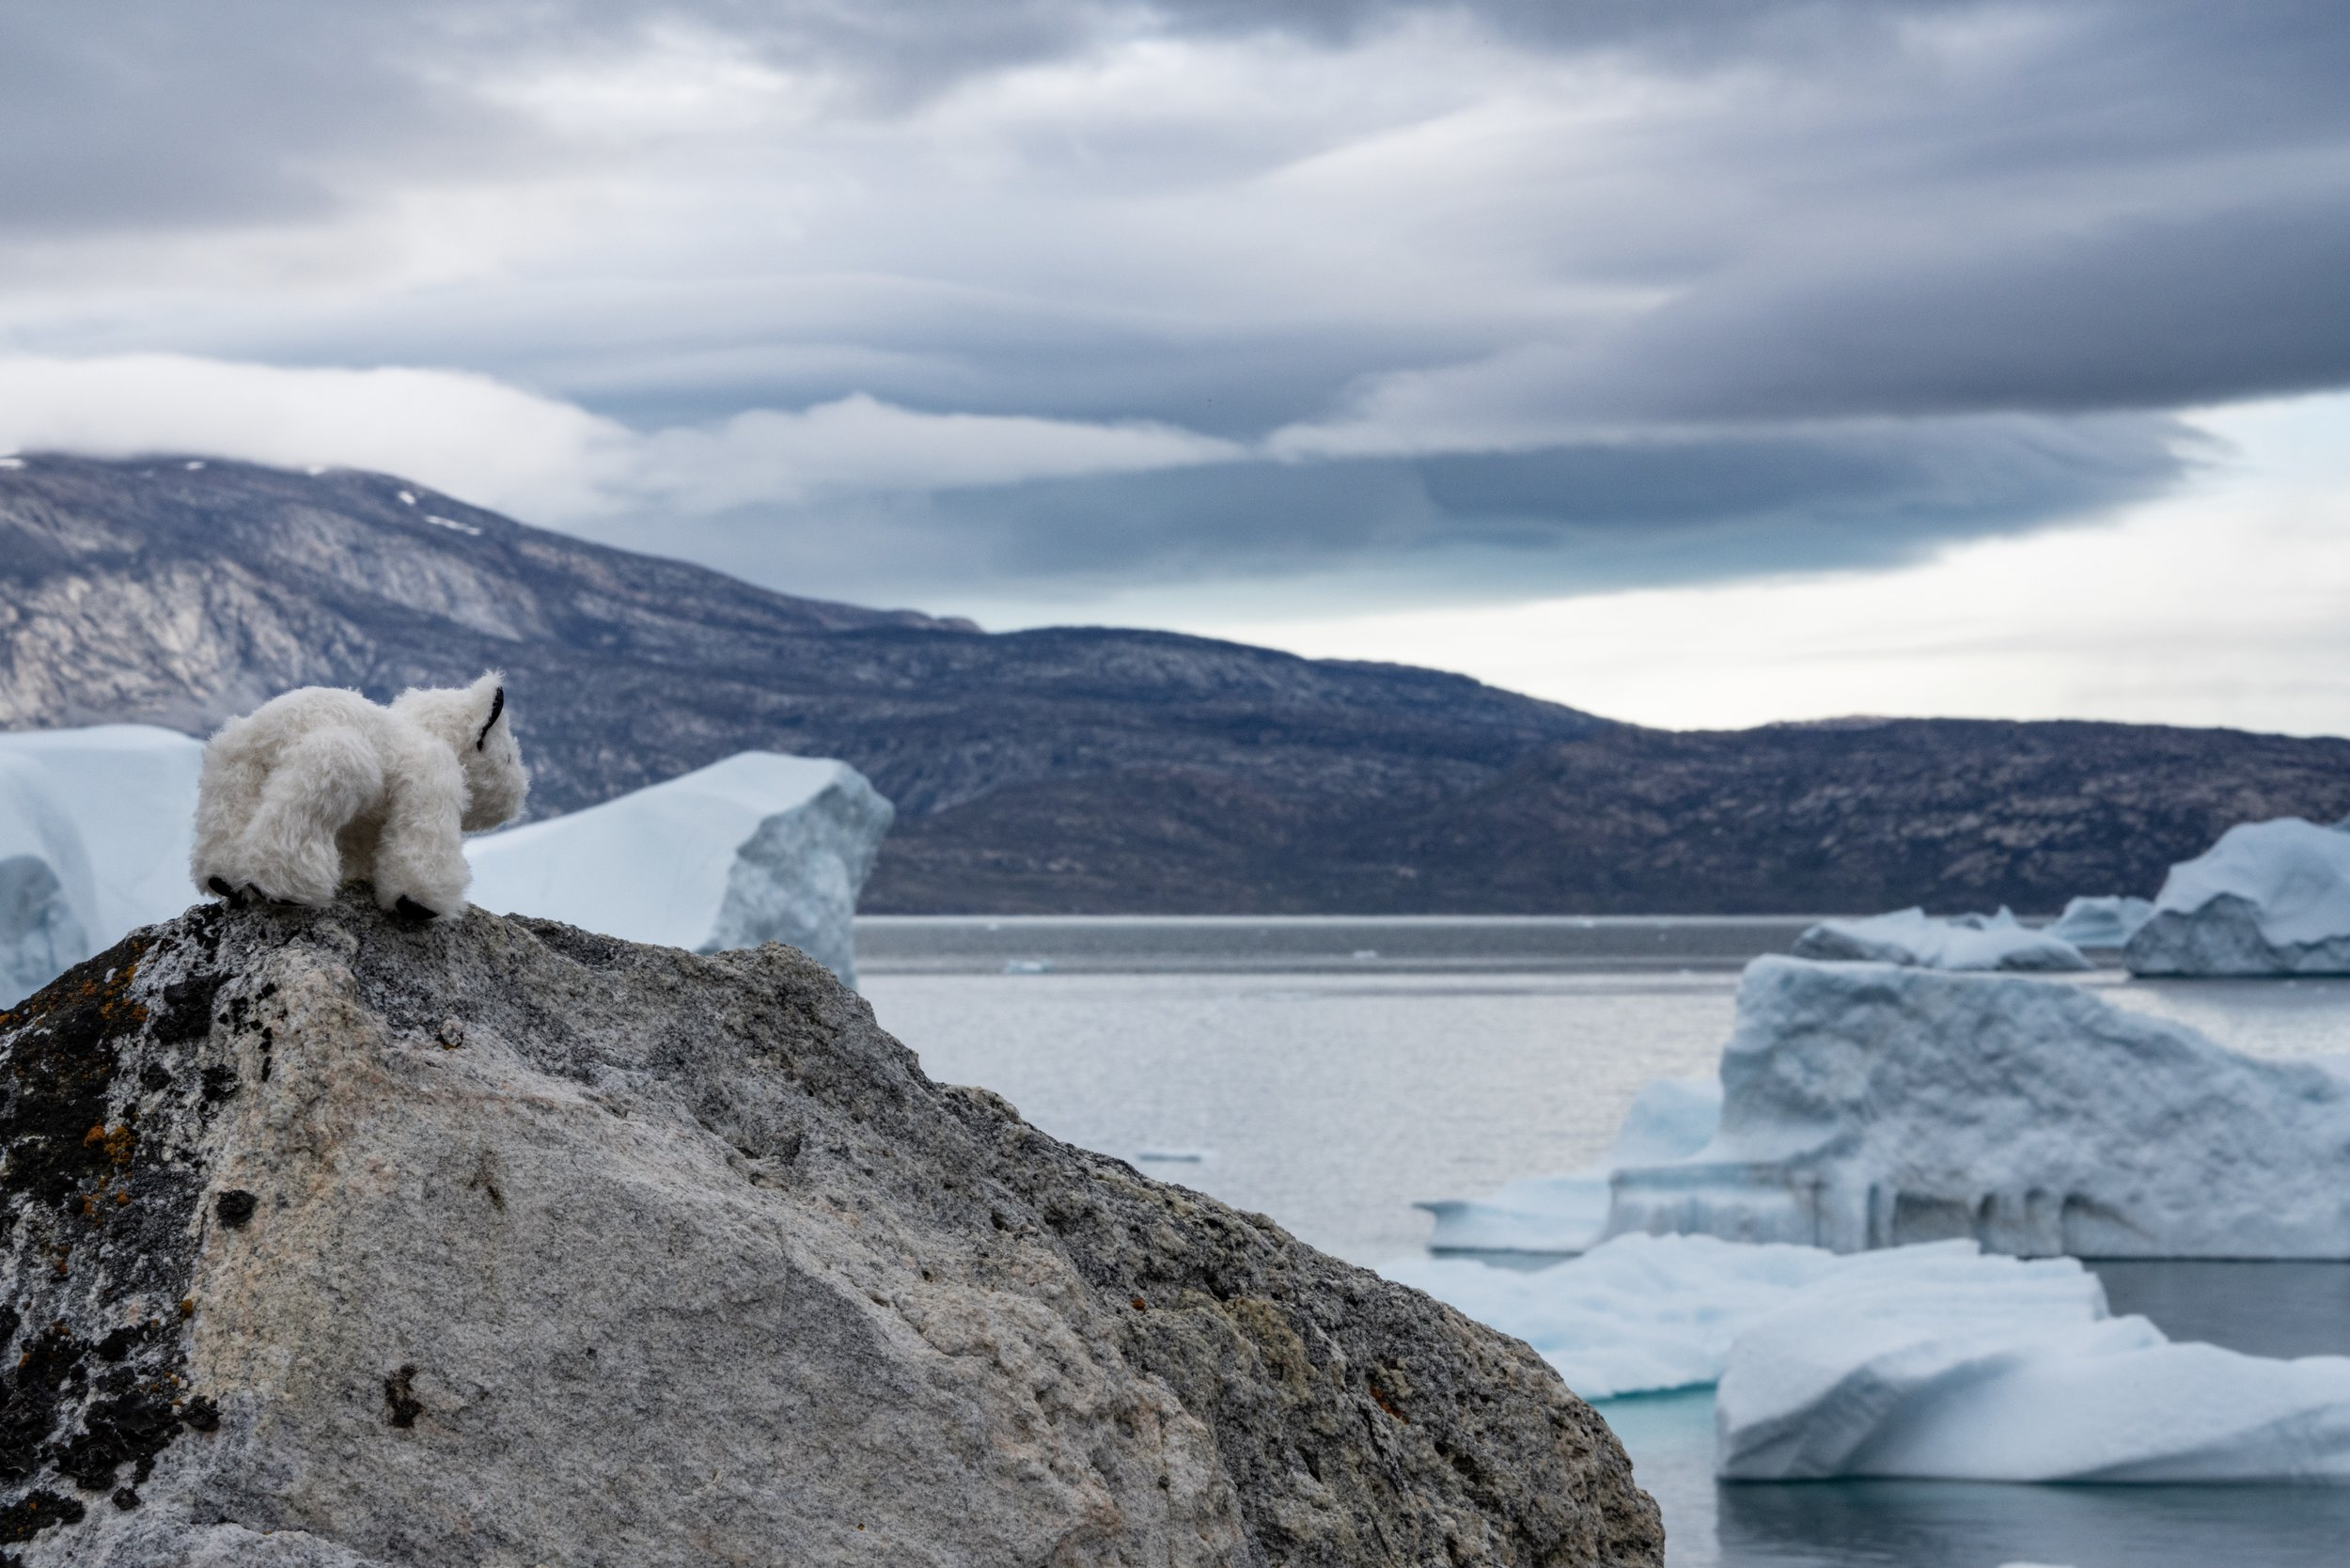 70°40'N | 51°24'W ● Storøen | Greenland